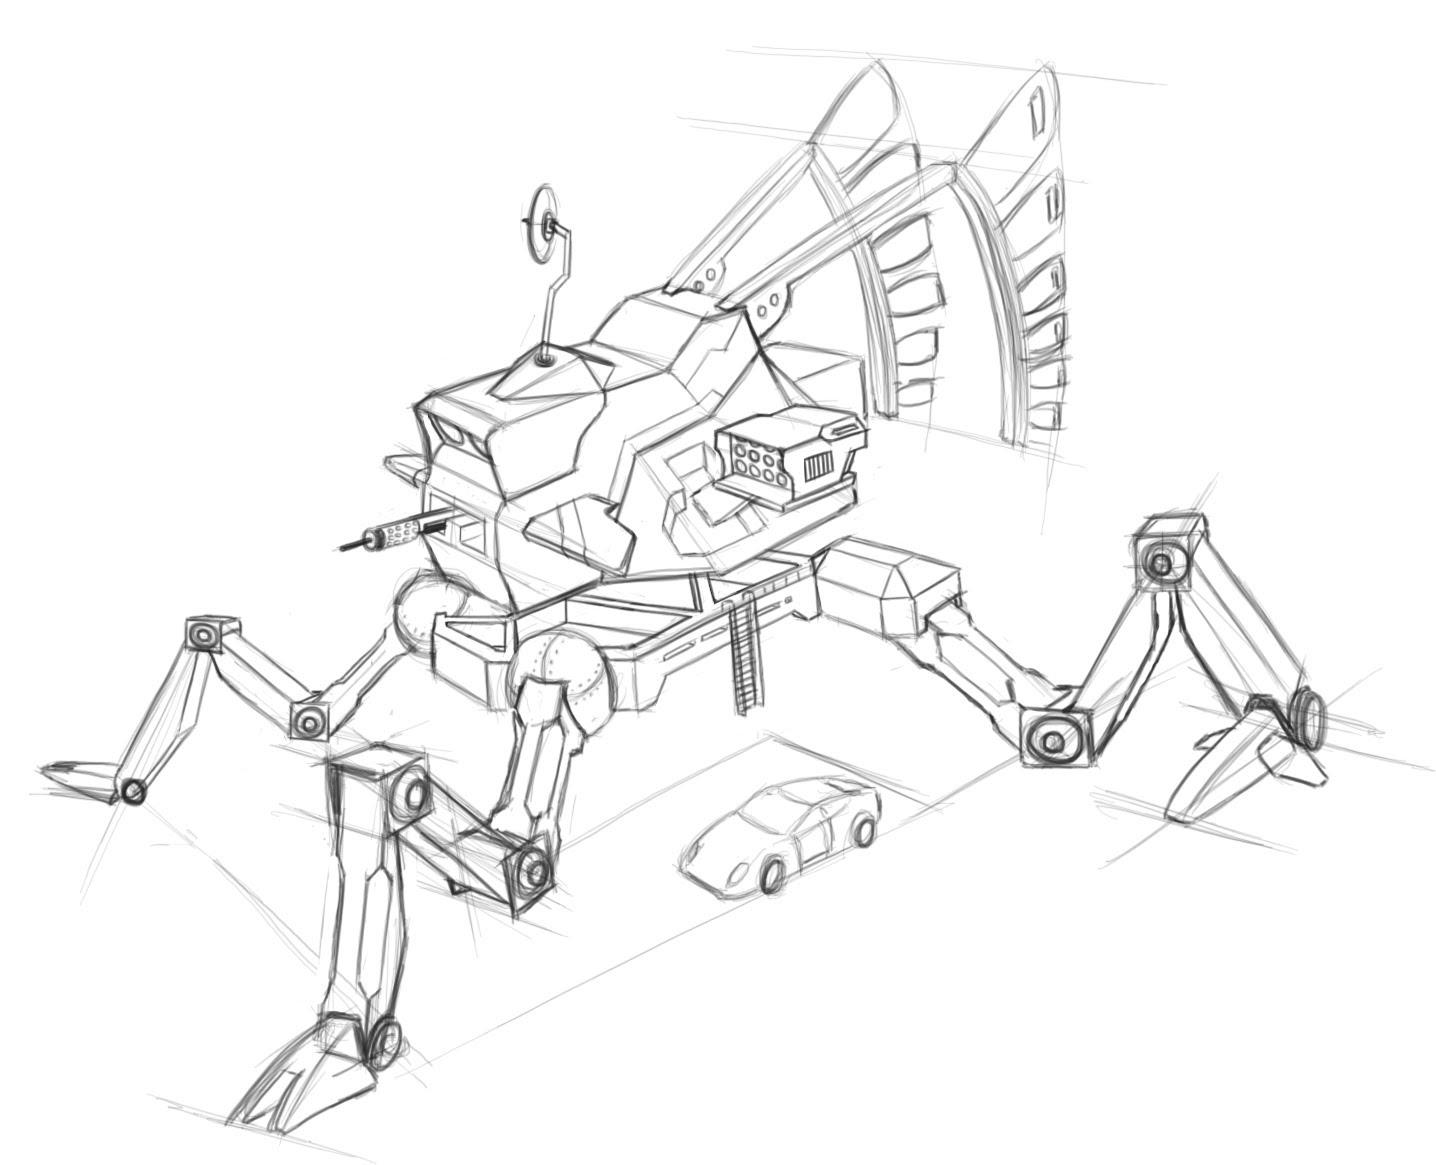 1436x1165 Concept Art Robot Sketching Tutorial (Part 2)